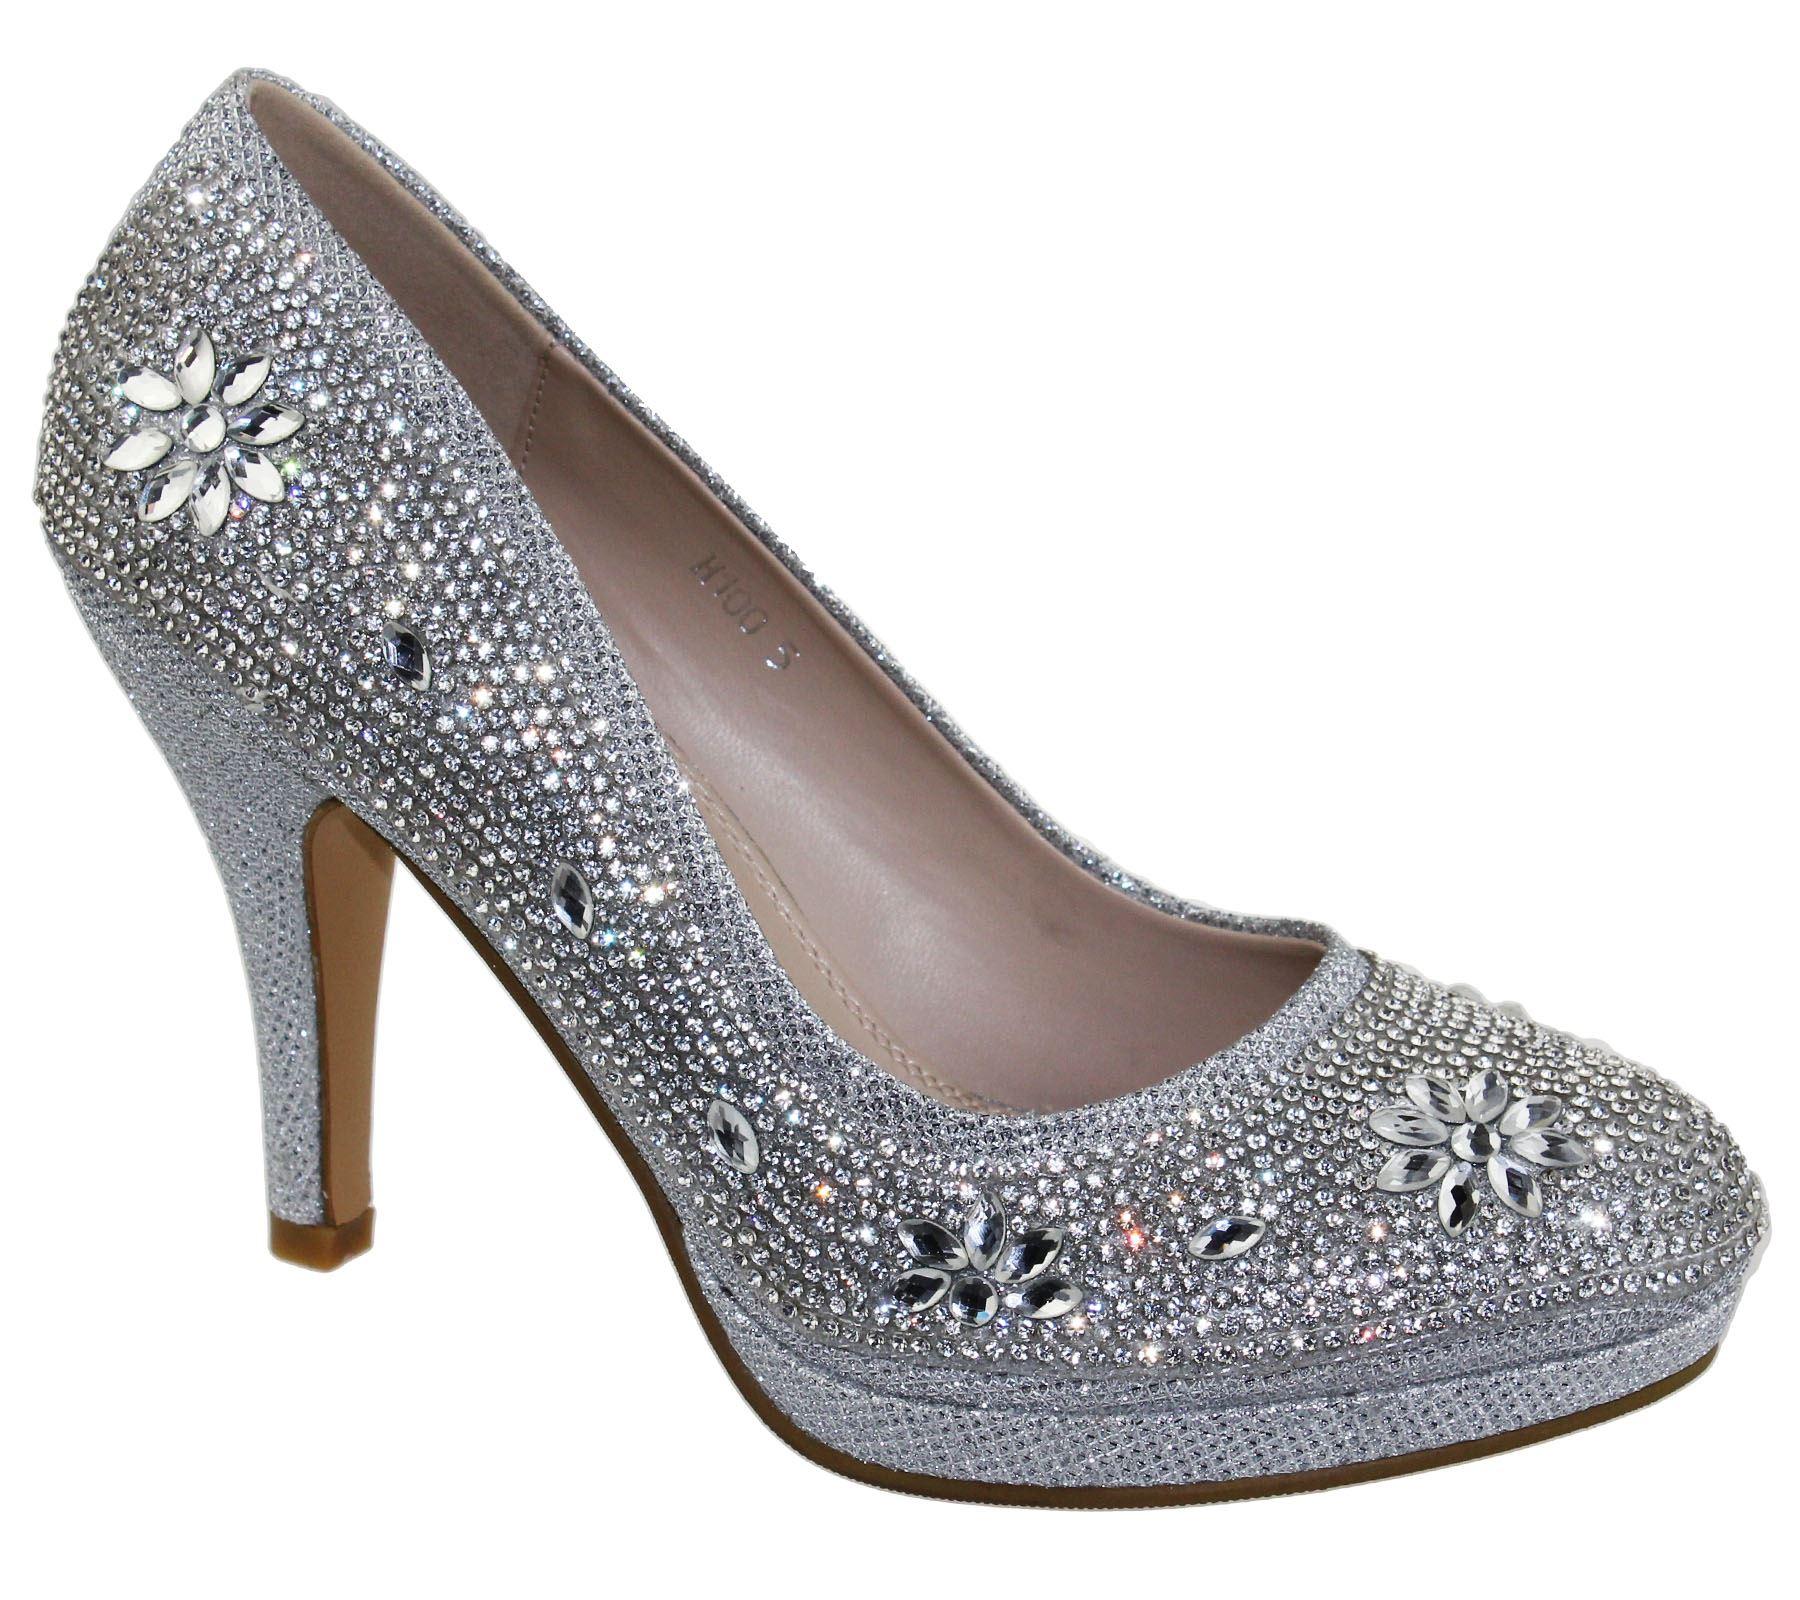 Womens-Platforms-High-Heels-Wedding-Bridal-Evening-Diamante-Ladies-Party-Shoes miniatura 14